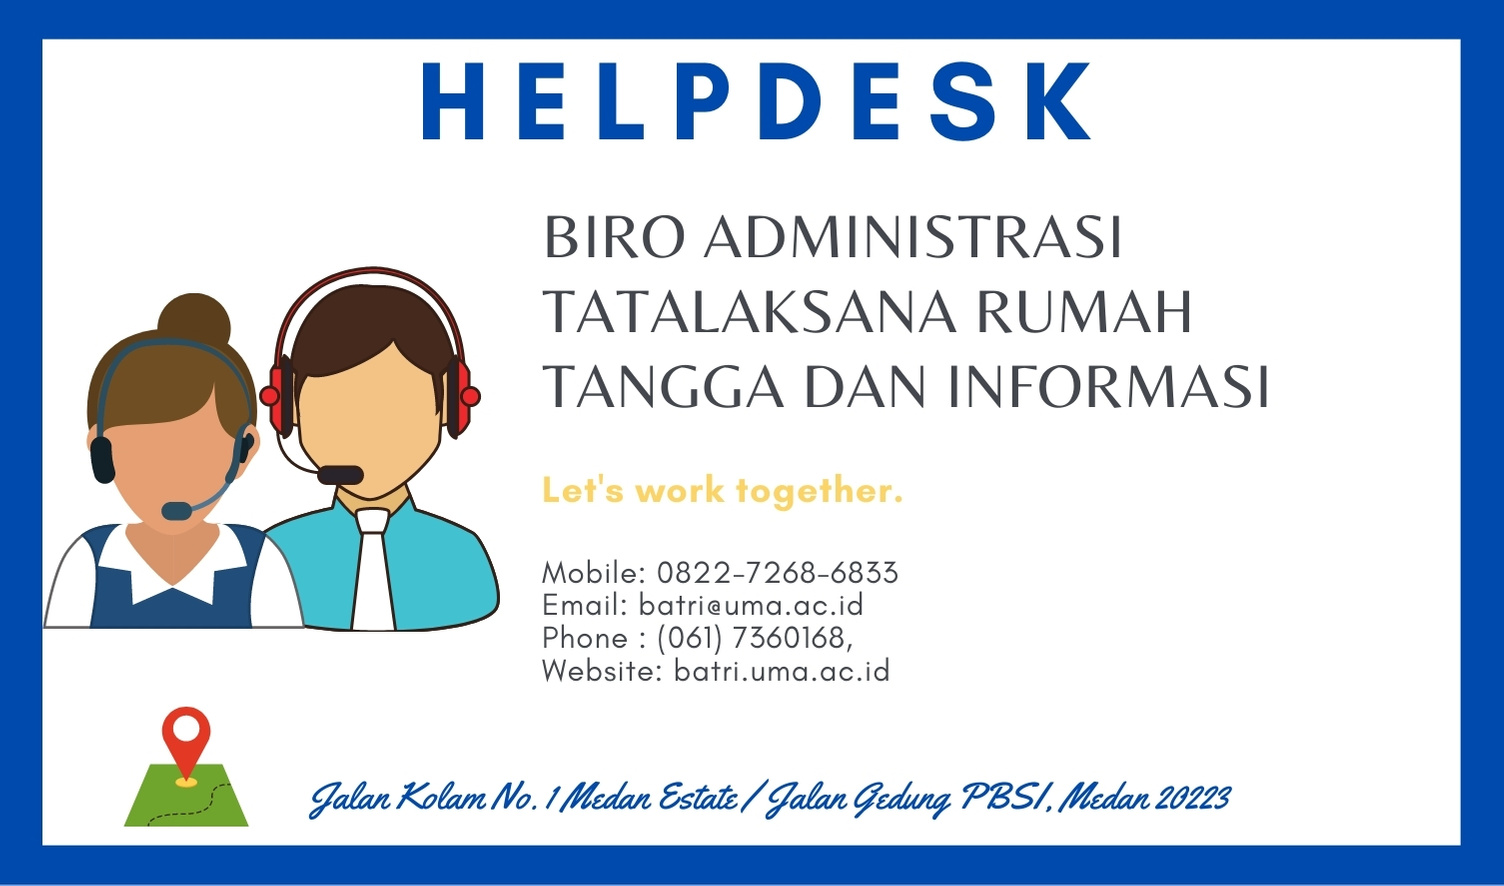 Helpdesk BATRI